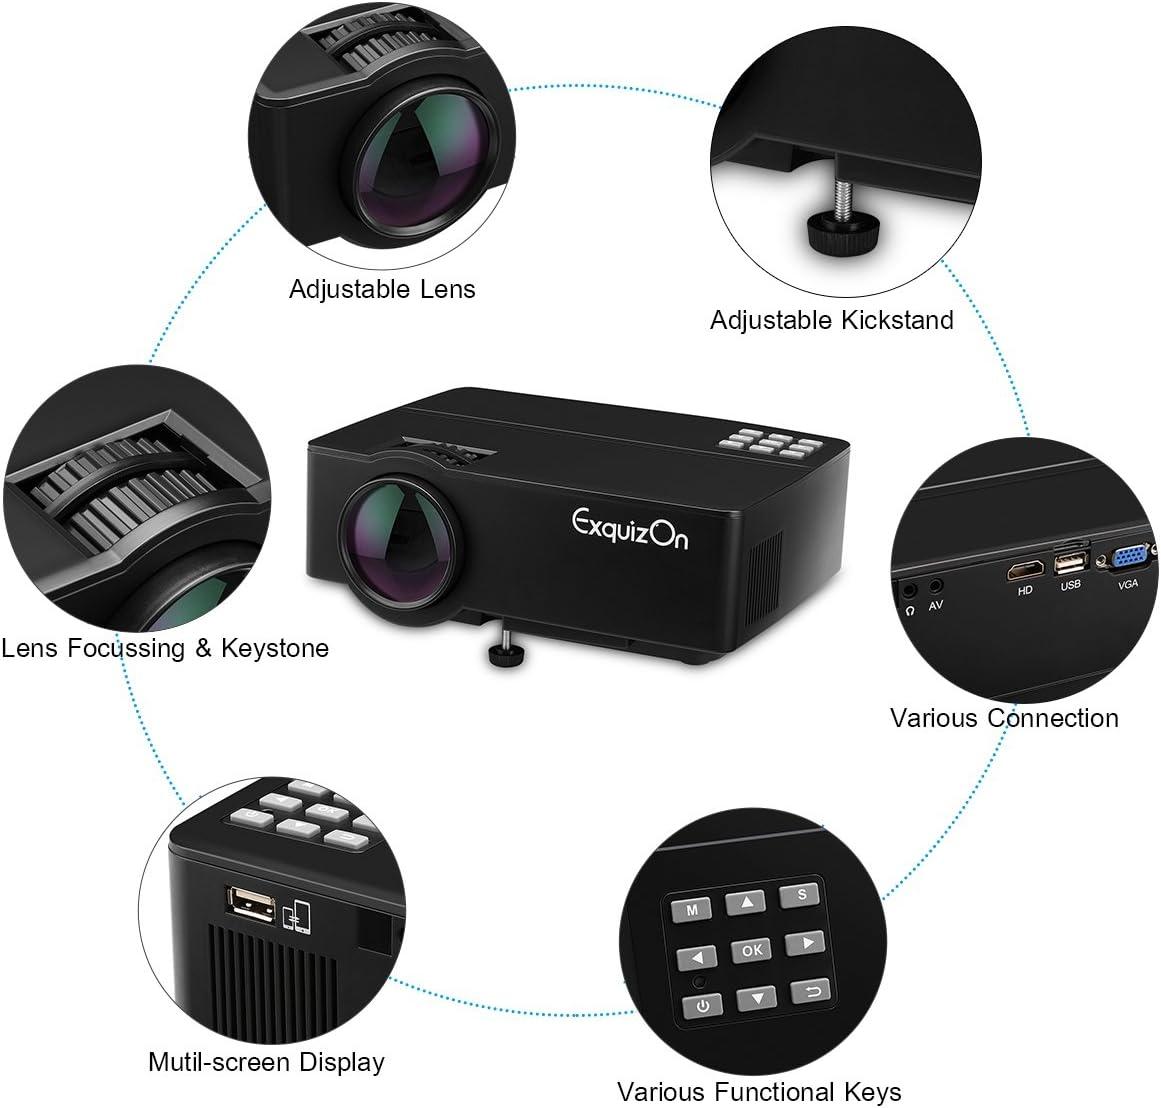 Exquizon E08 - LED Proyector Home Cinema Multimedia (800x480P ...